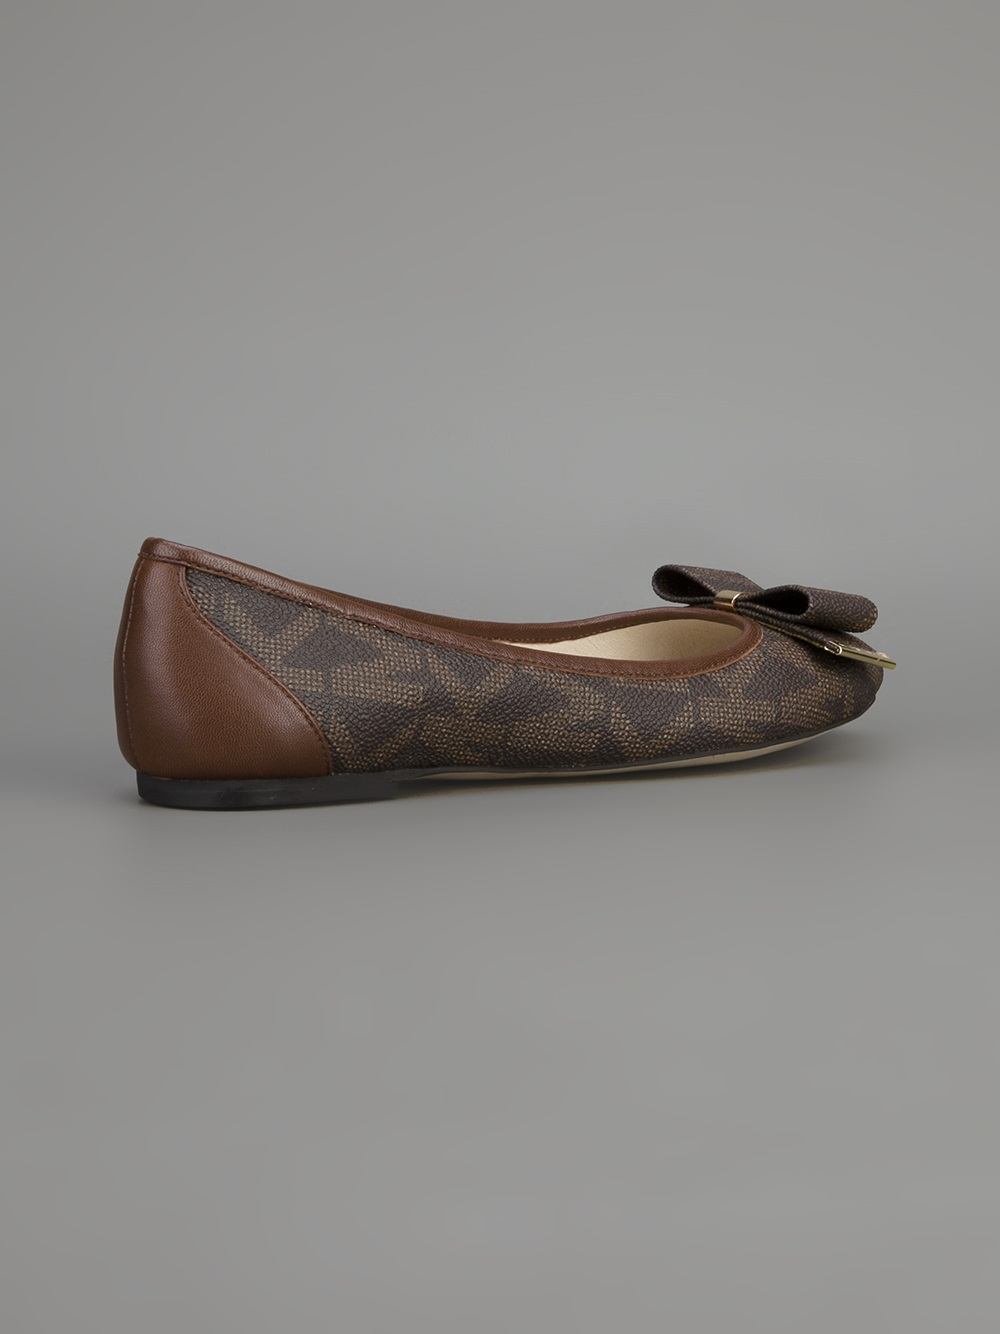 Lyst Michael Kors Delphine Logo Ballet Flat In Gray